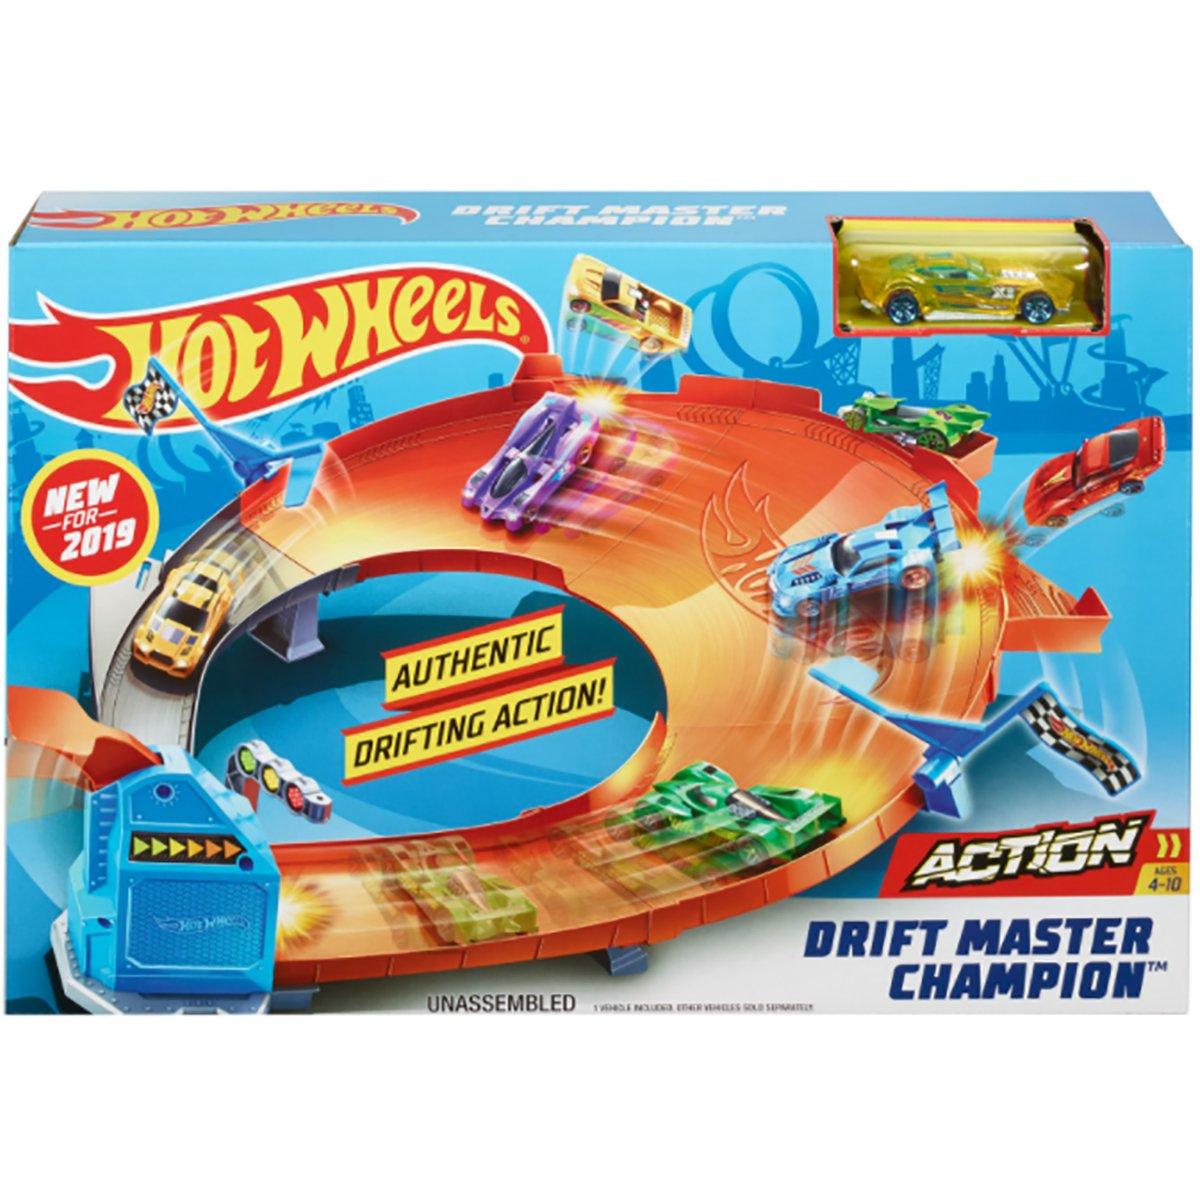 Set de joaca Circuit cu obstacole Hot Wheels, Drift Master Champion GBF84